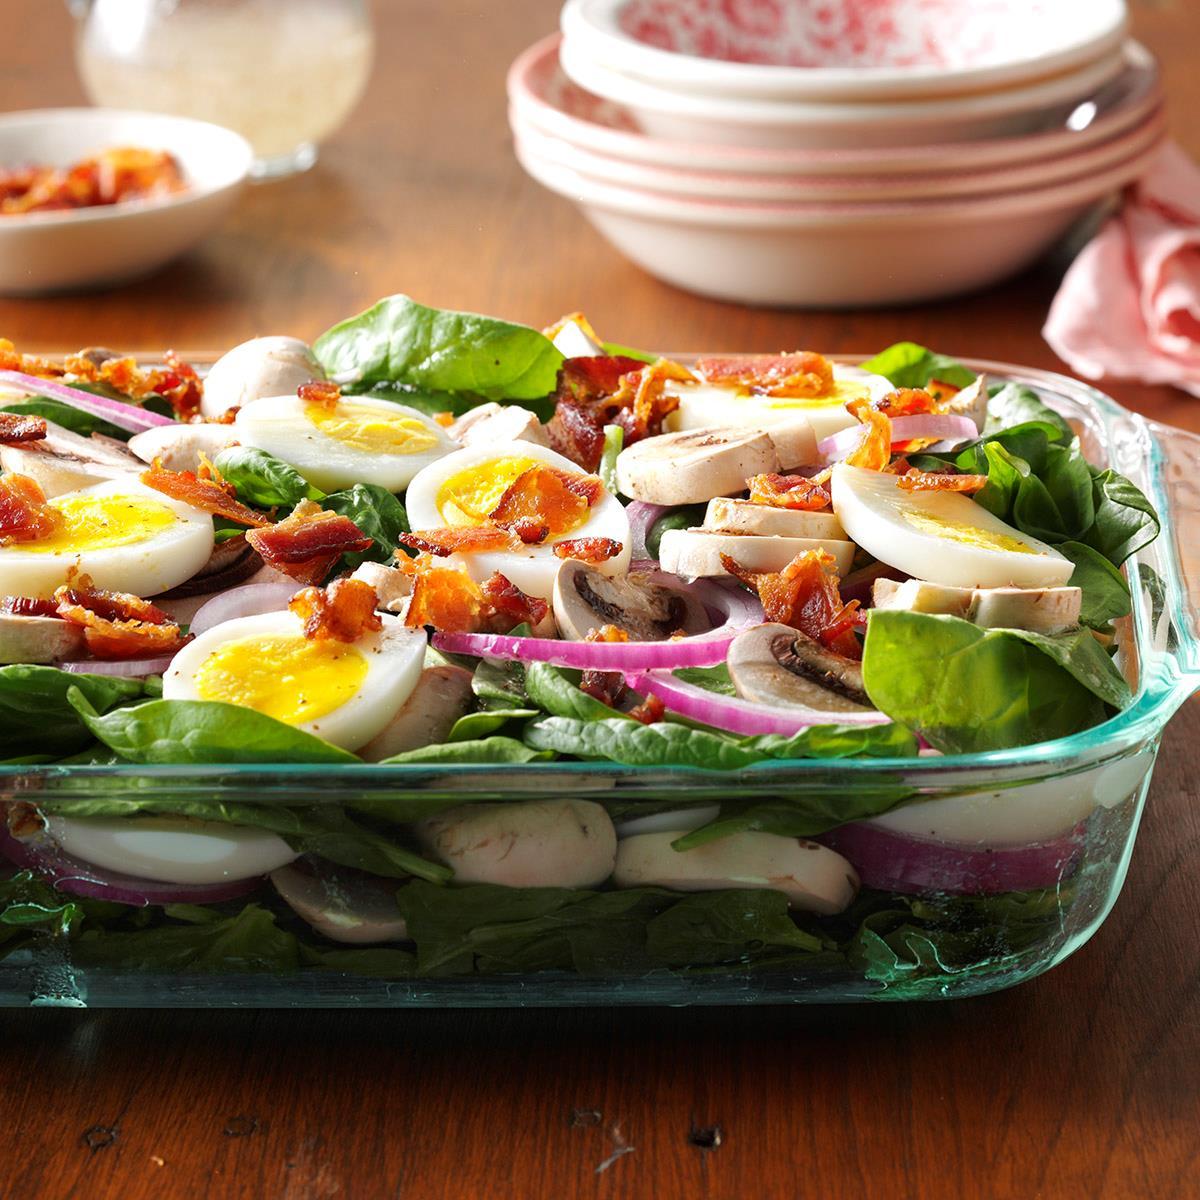 Grandma's Spinach Salad